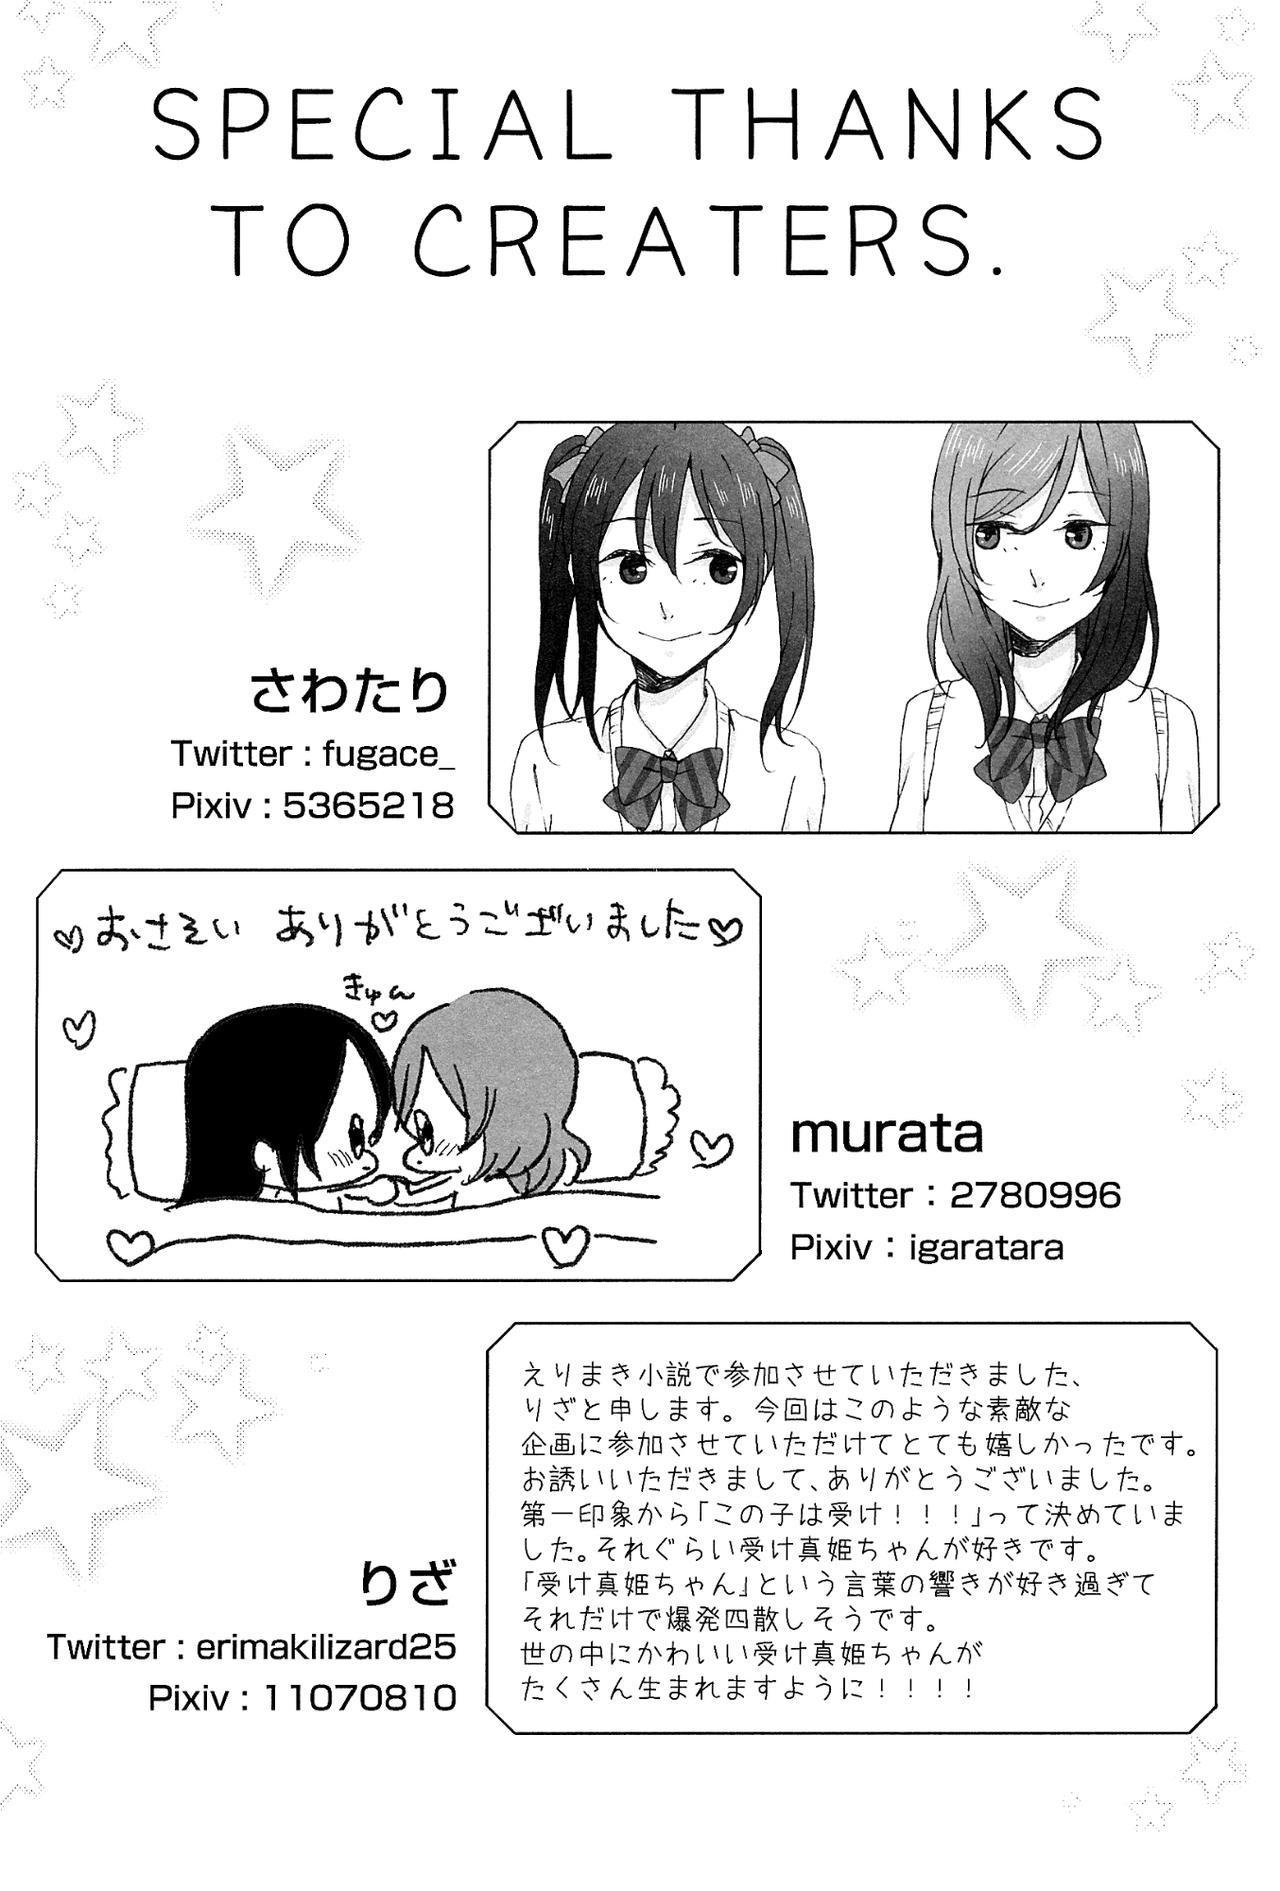 (Bokura no Love Live! 10) [Labo (Various)] Maki-chan Aisare aiueo!   Maki-chan Loved Alphabetically! (Love Live!) [English] {/u/ scanlations} [Incomplete] 35